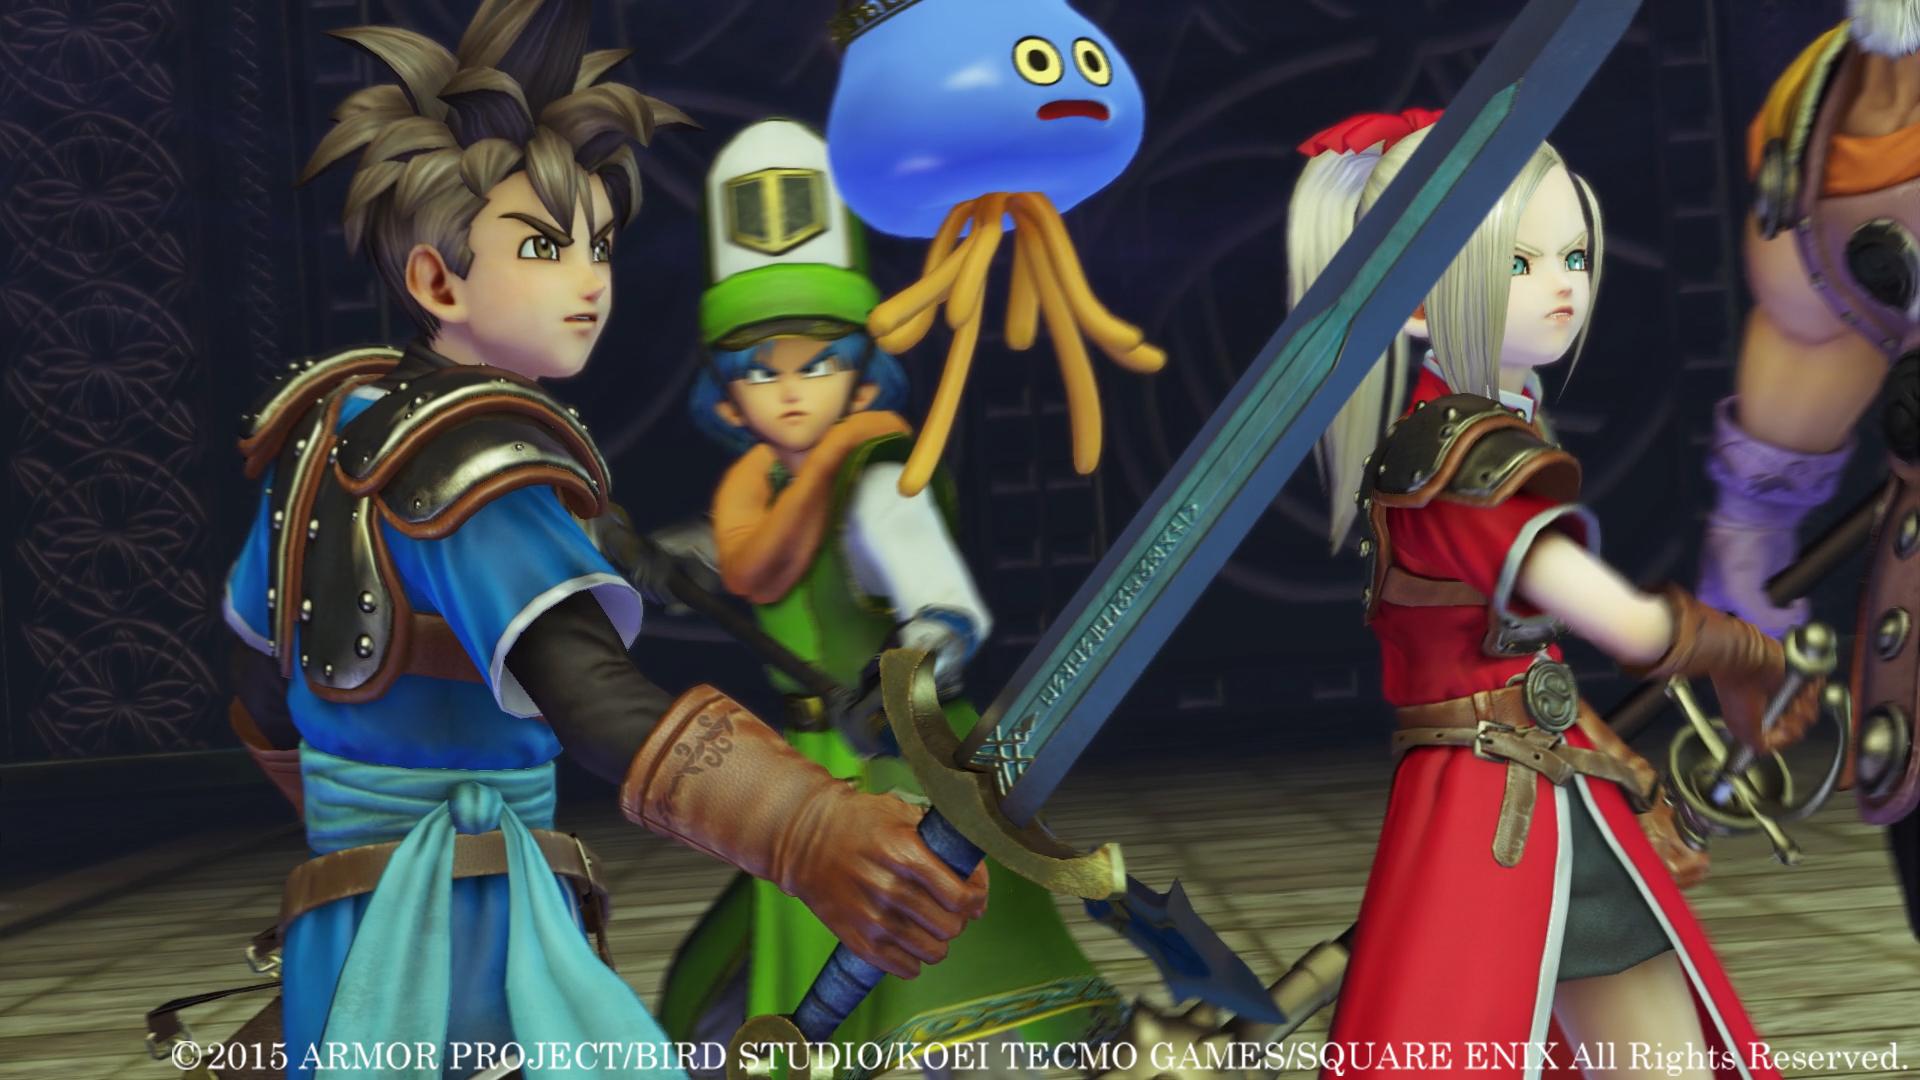 dragon-quest-heroes-slime-edition-pc-screenshot-3